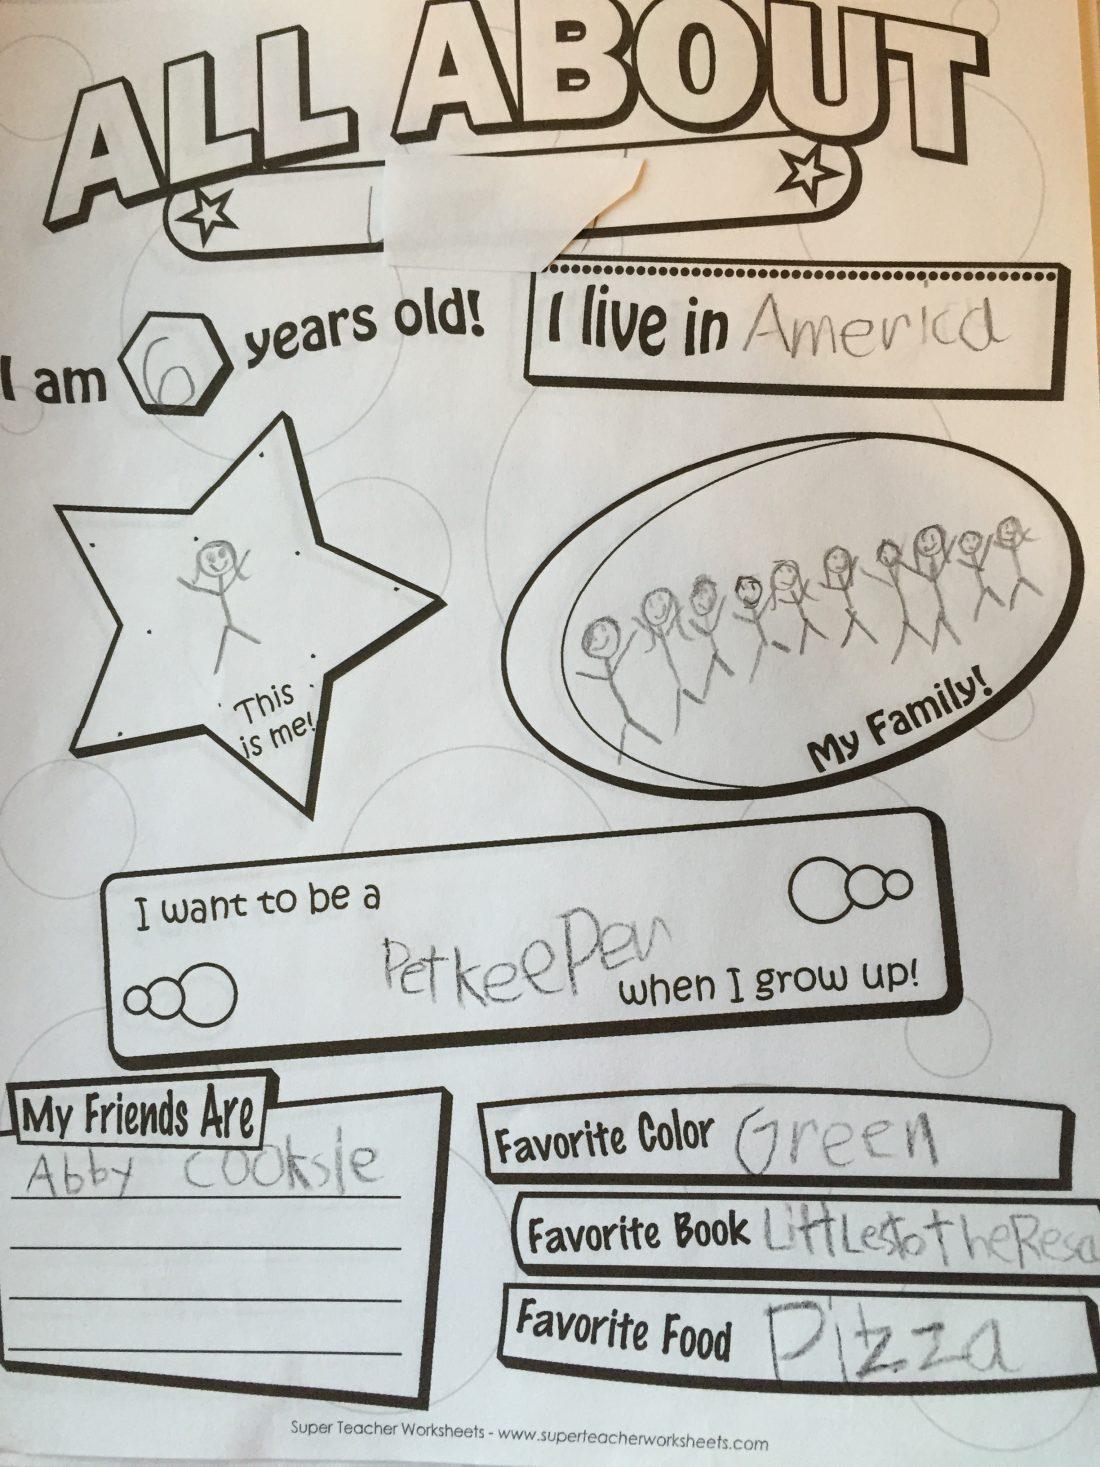 Super Teacher Worksheets 3rd Grade : Super teacher worksheets multiplication rd grade